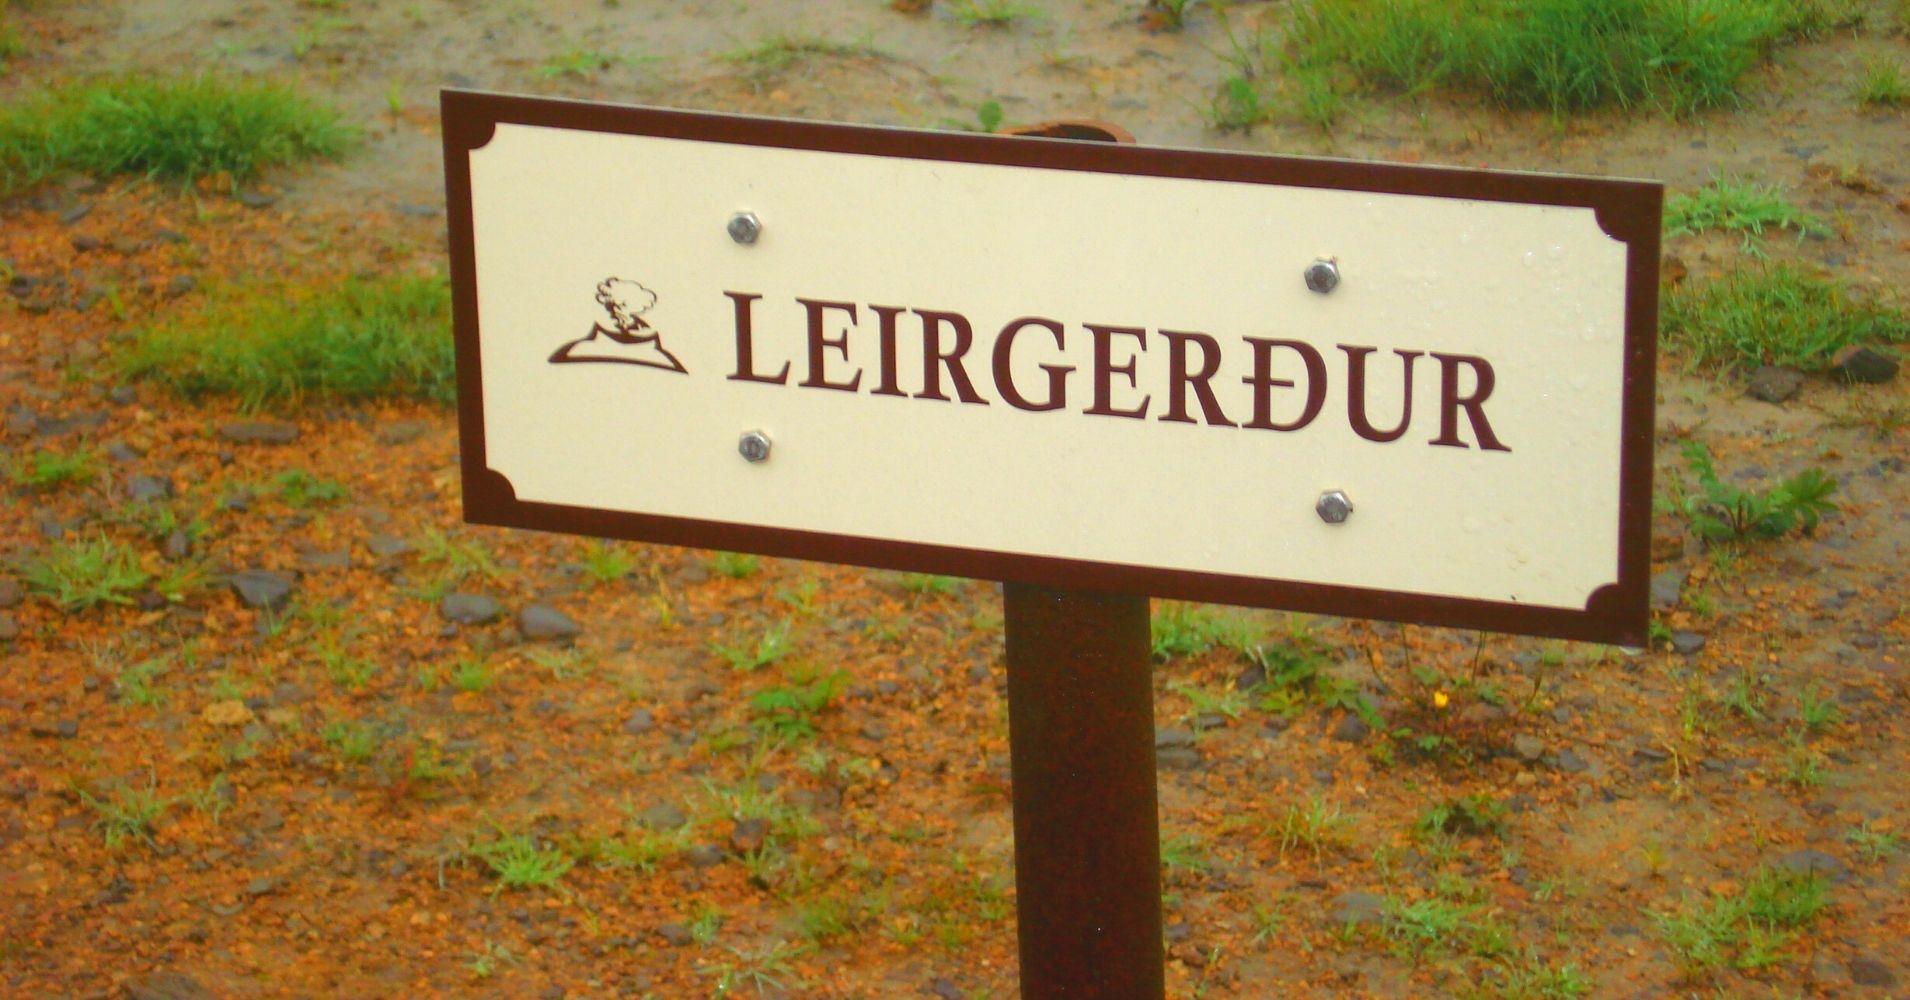 Manantiales Geotérmicos de Leirgedur. Road Trip por Islandia.